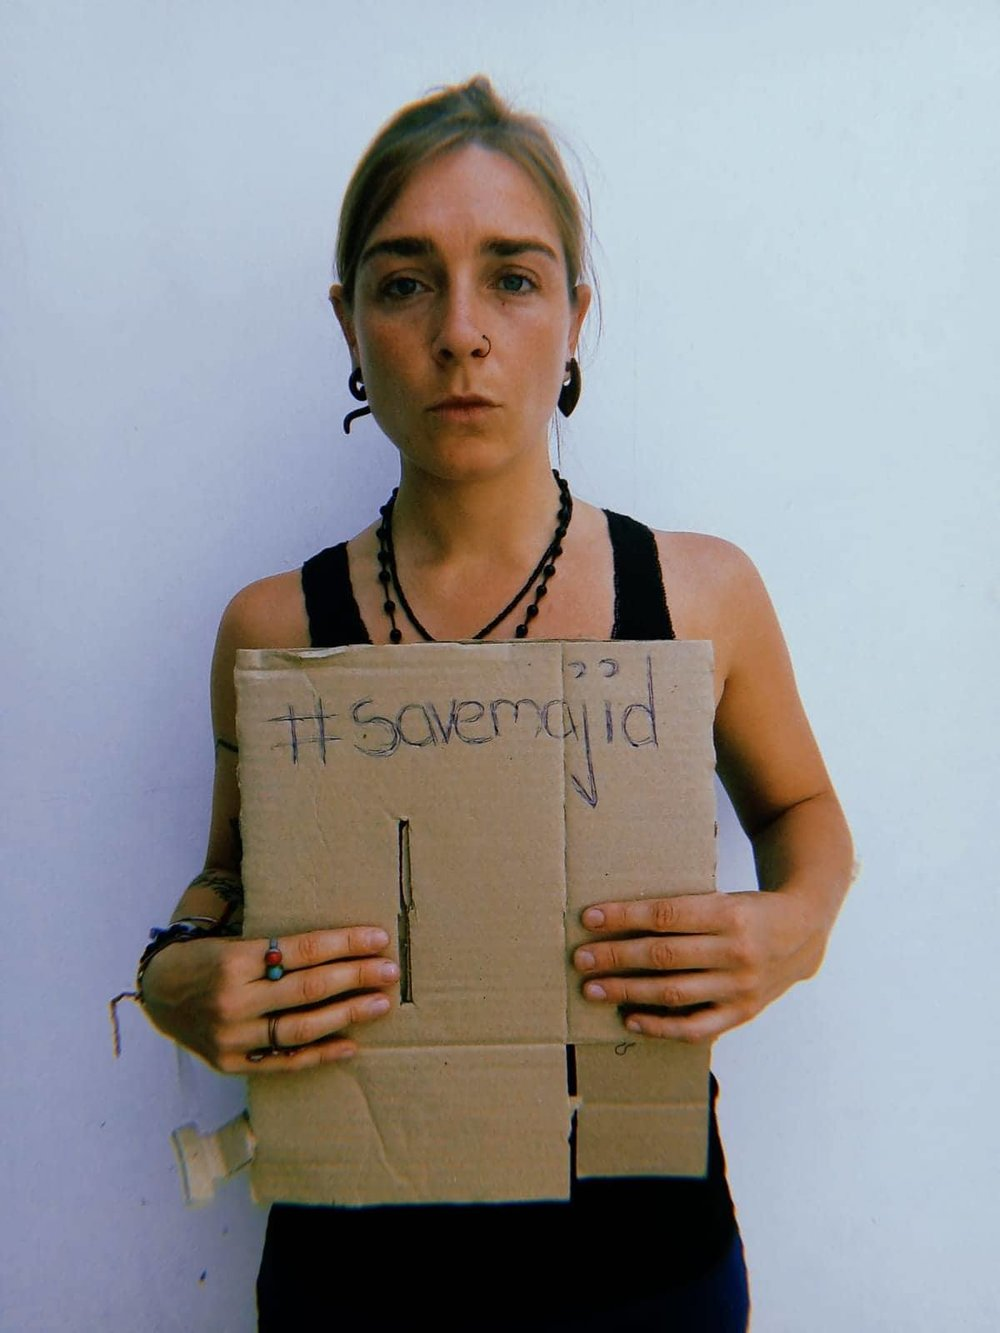 Patriz holding sign